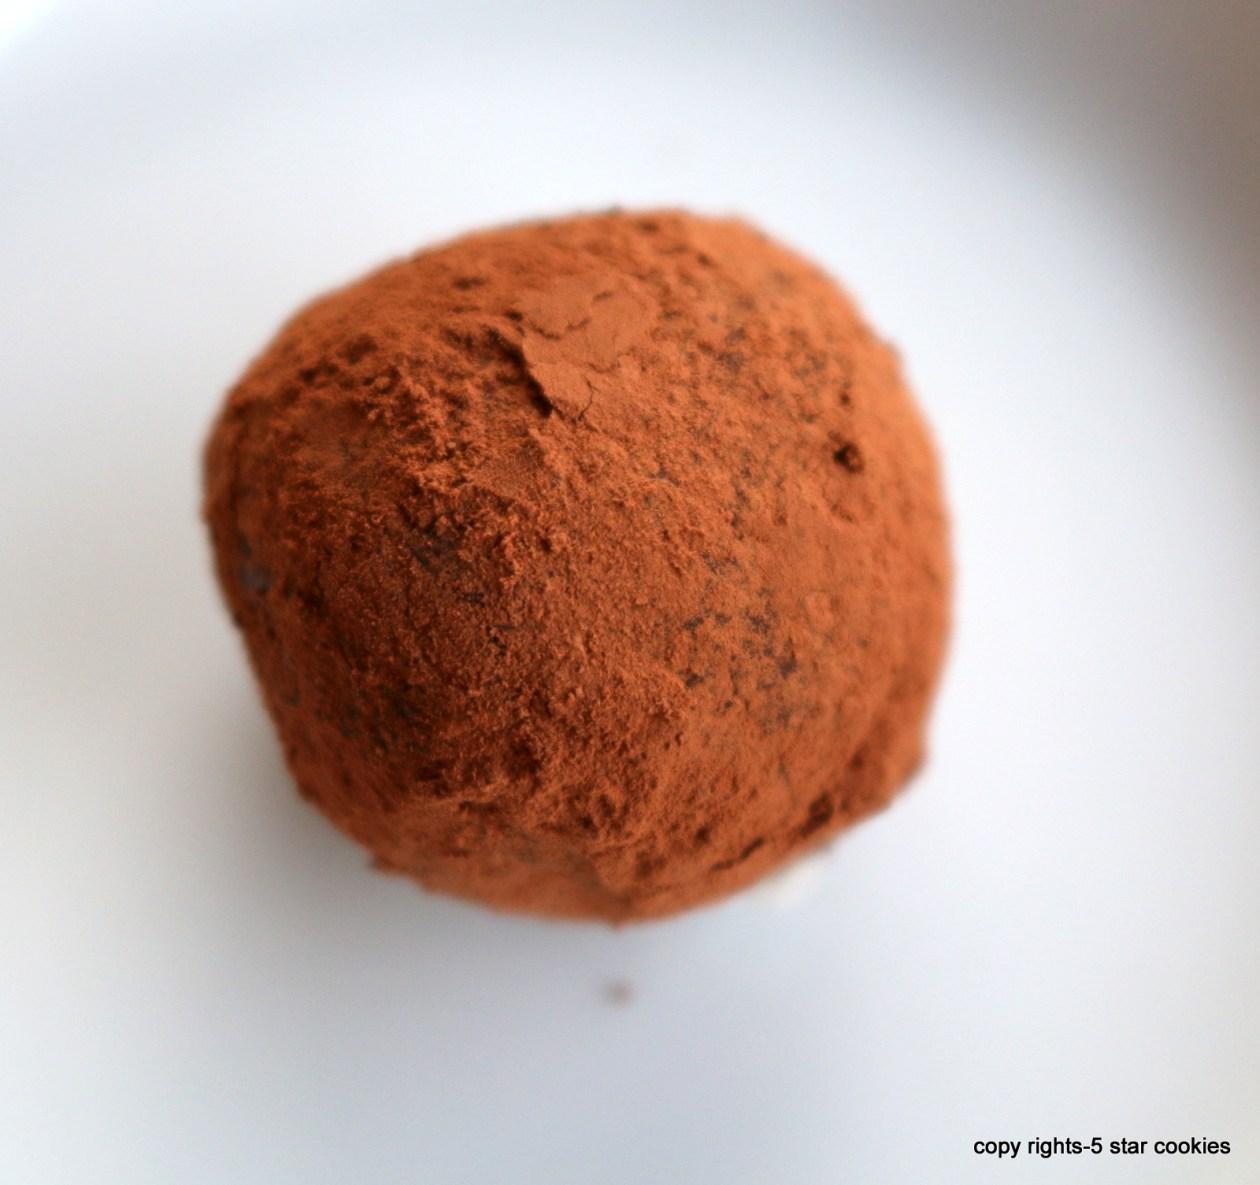 chocolate truffles from the best food blog 5starcookies-enjoy